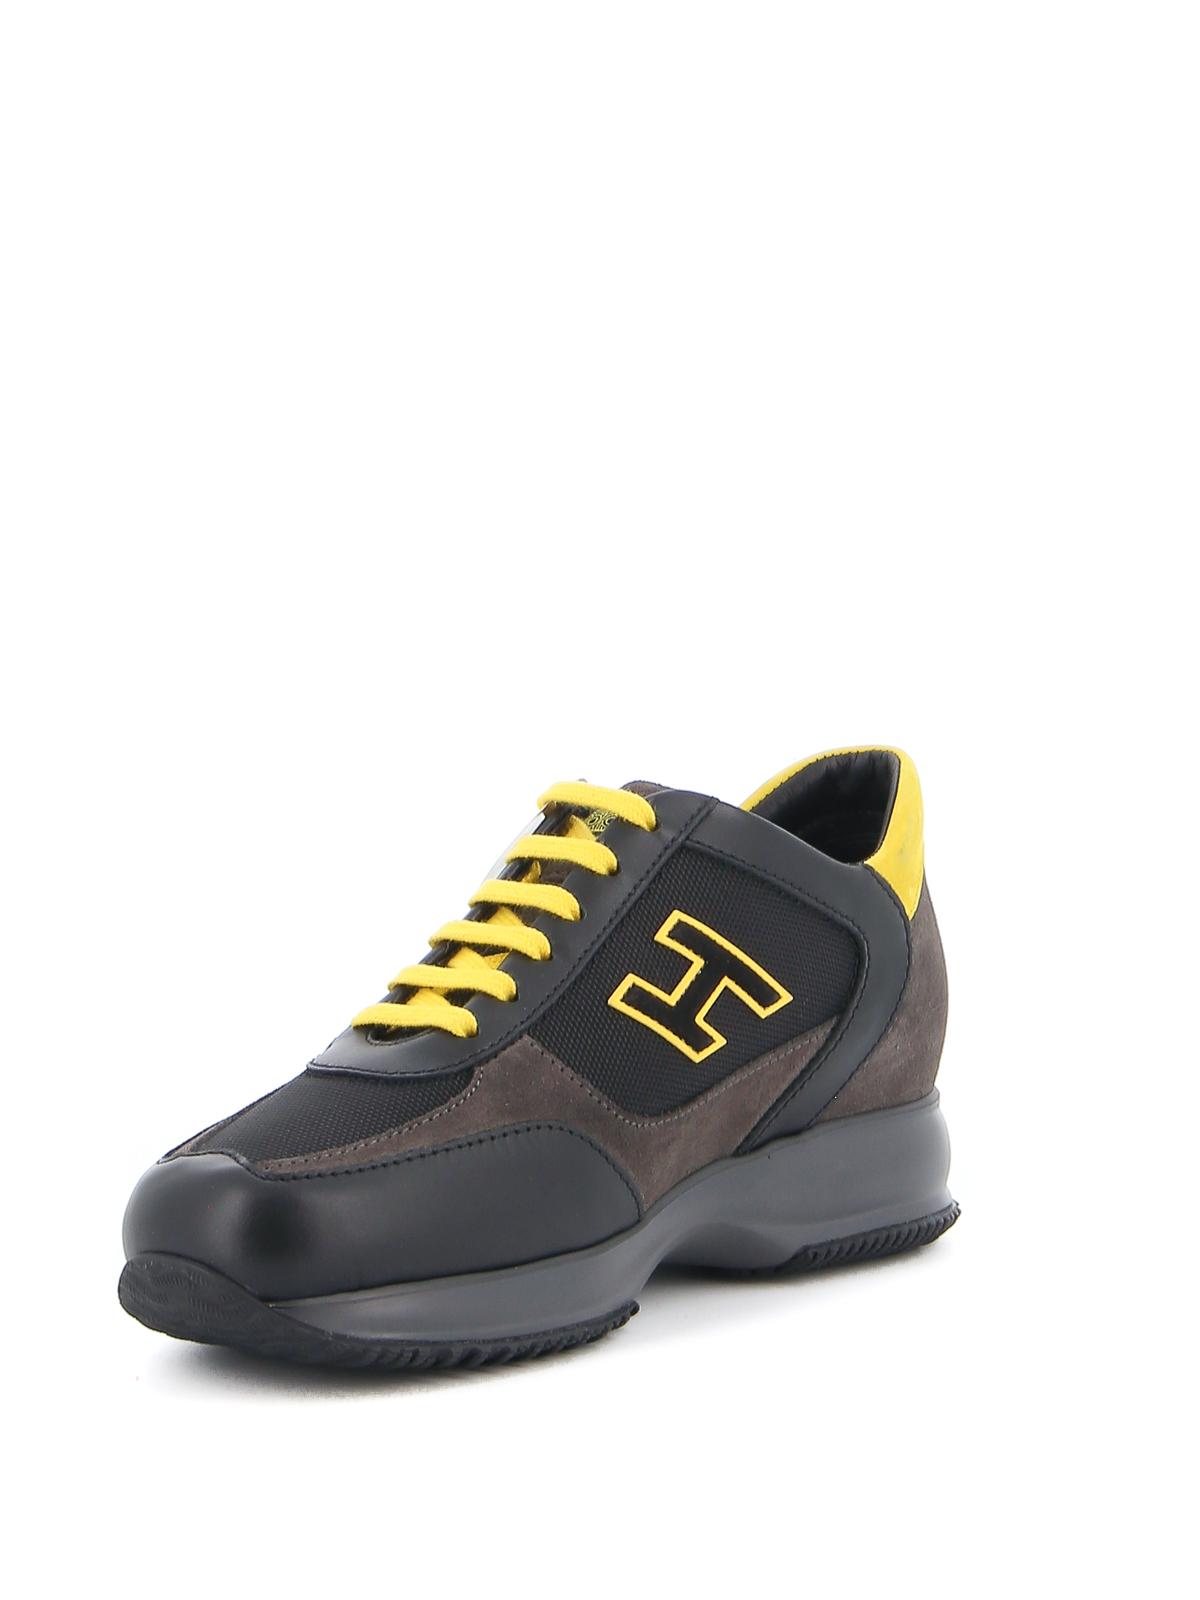 Trainers Hogan - Interactive black sneakers - HXM00N0Q101O8M50BJ